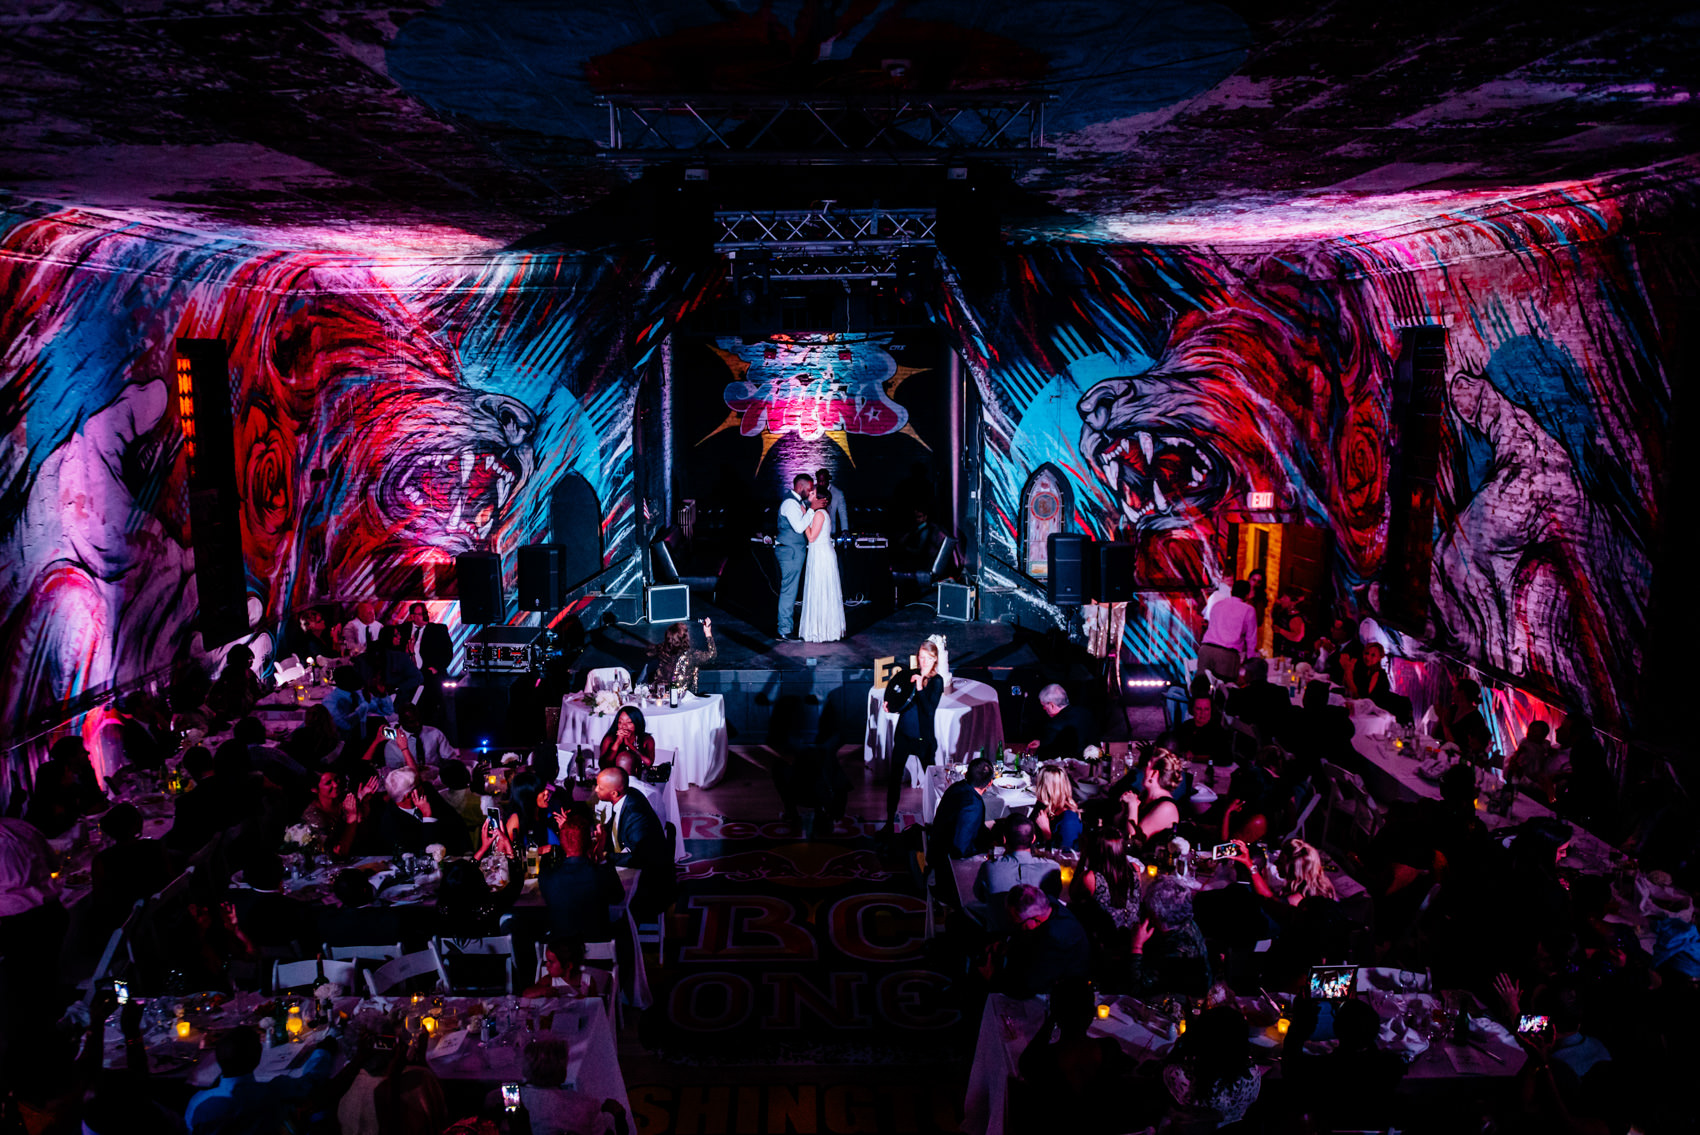 020-oberports-wedding-reception-portfolio